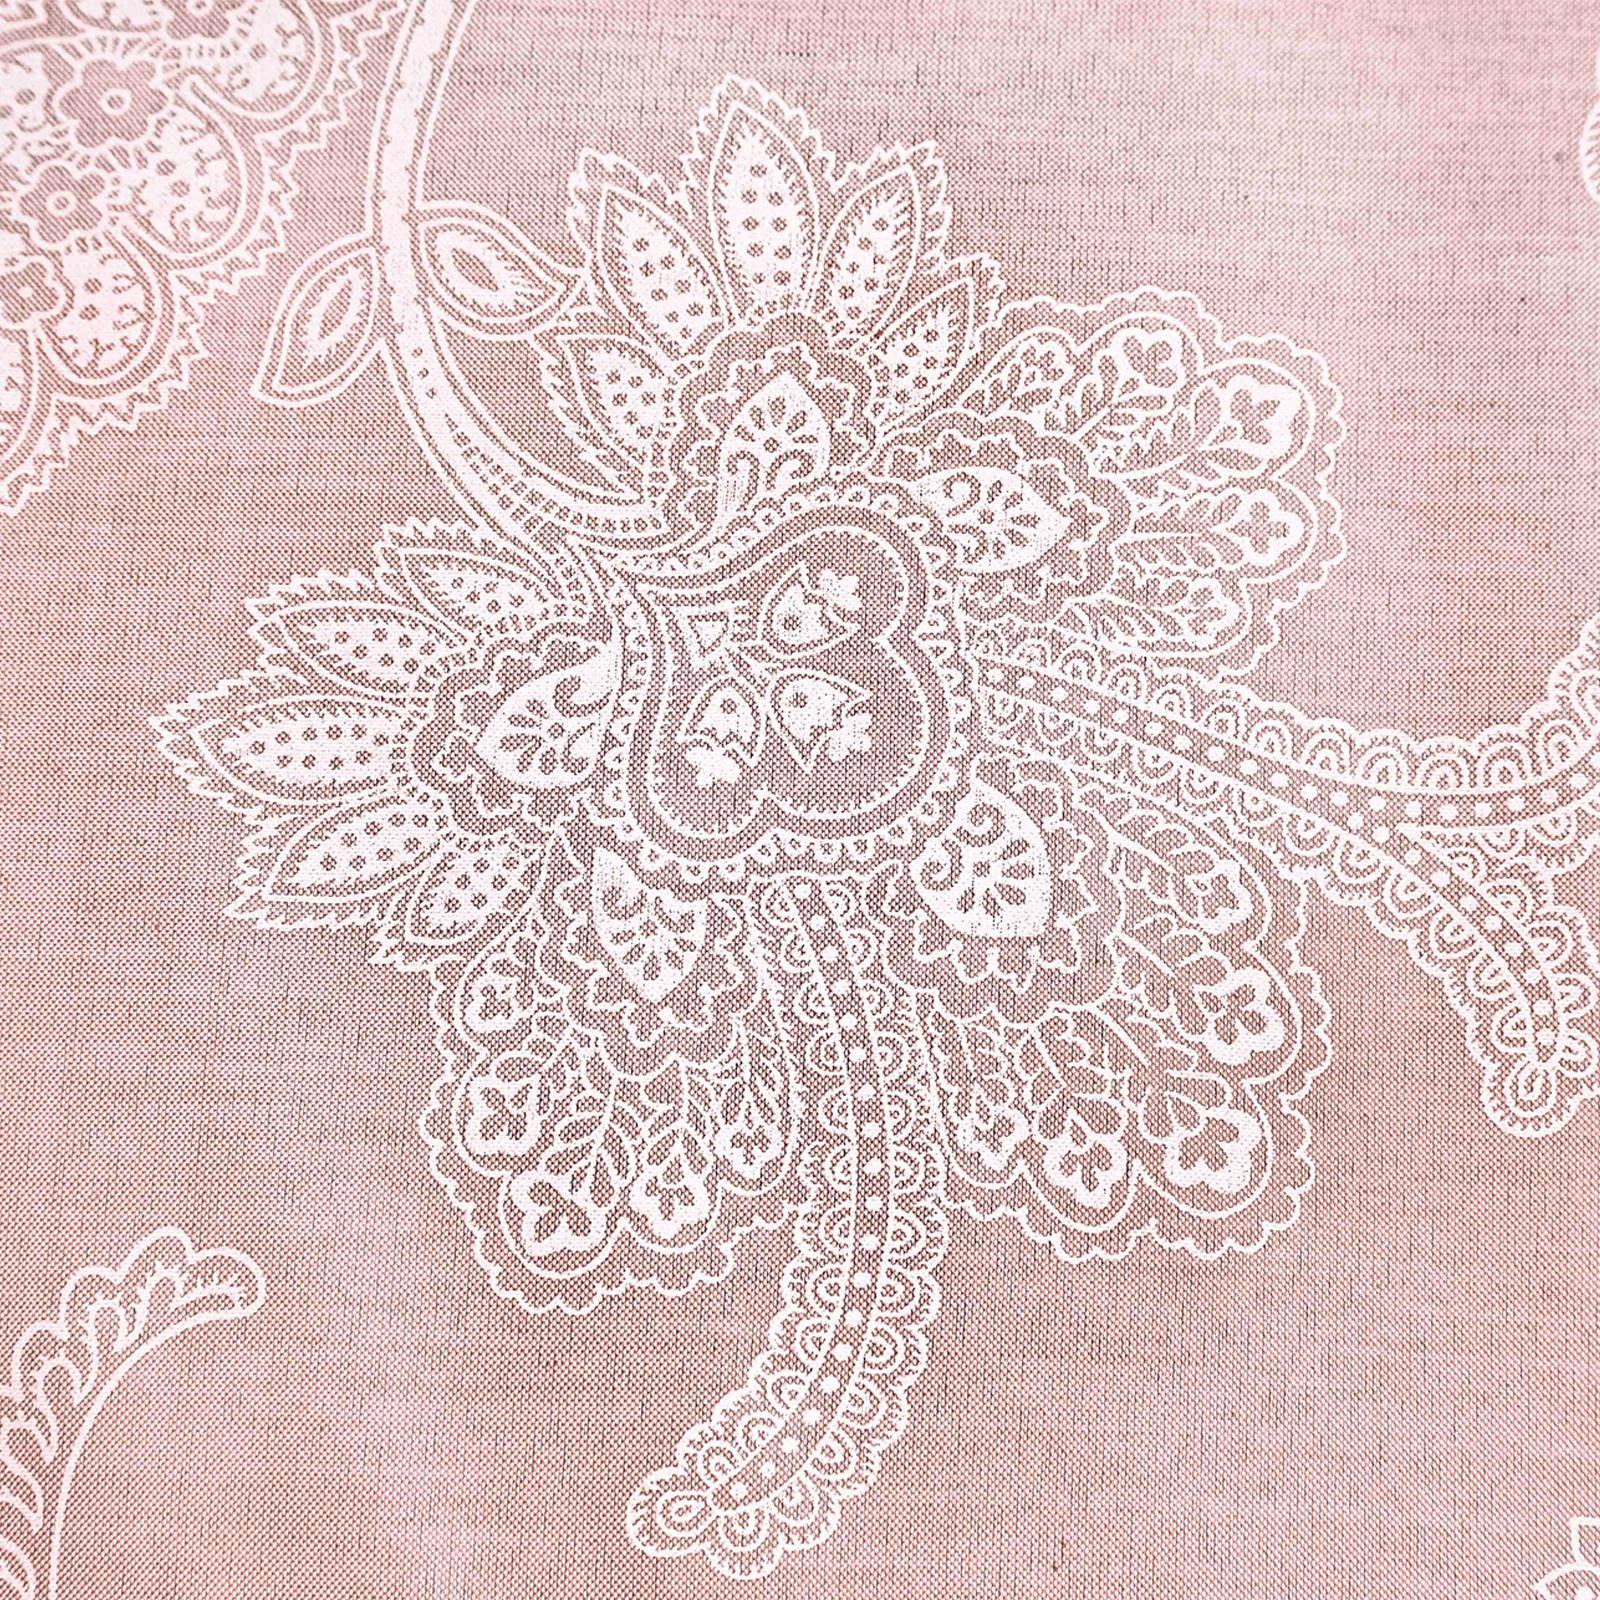 Calidad Superior fil-a-fil Chambray patrón de Encaje Floral Edredón Duvet cover set